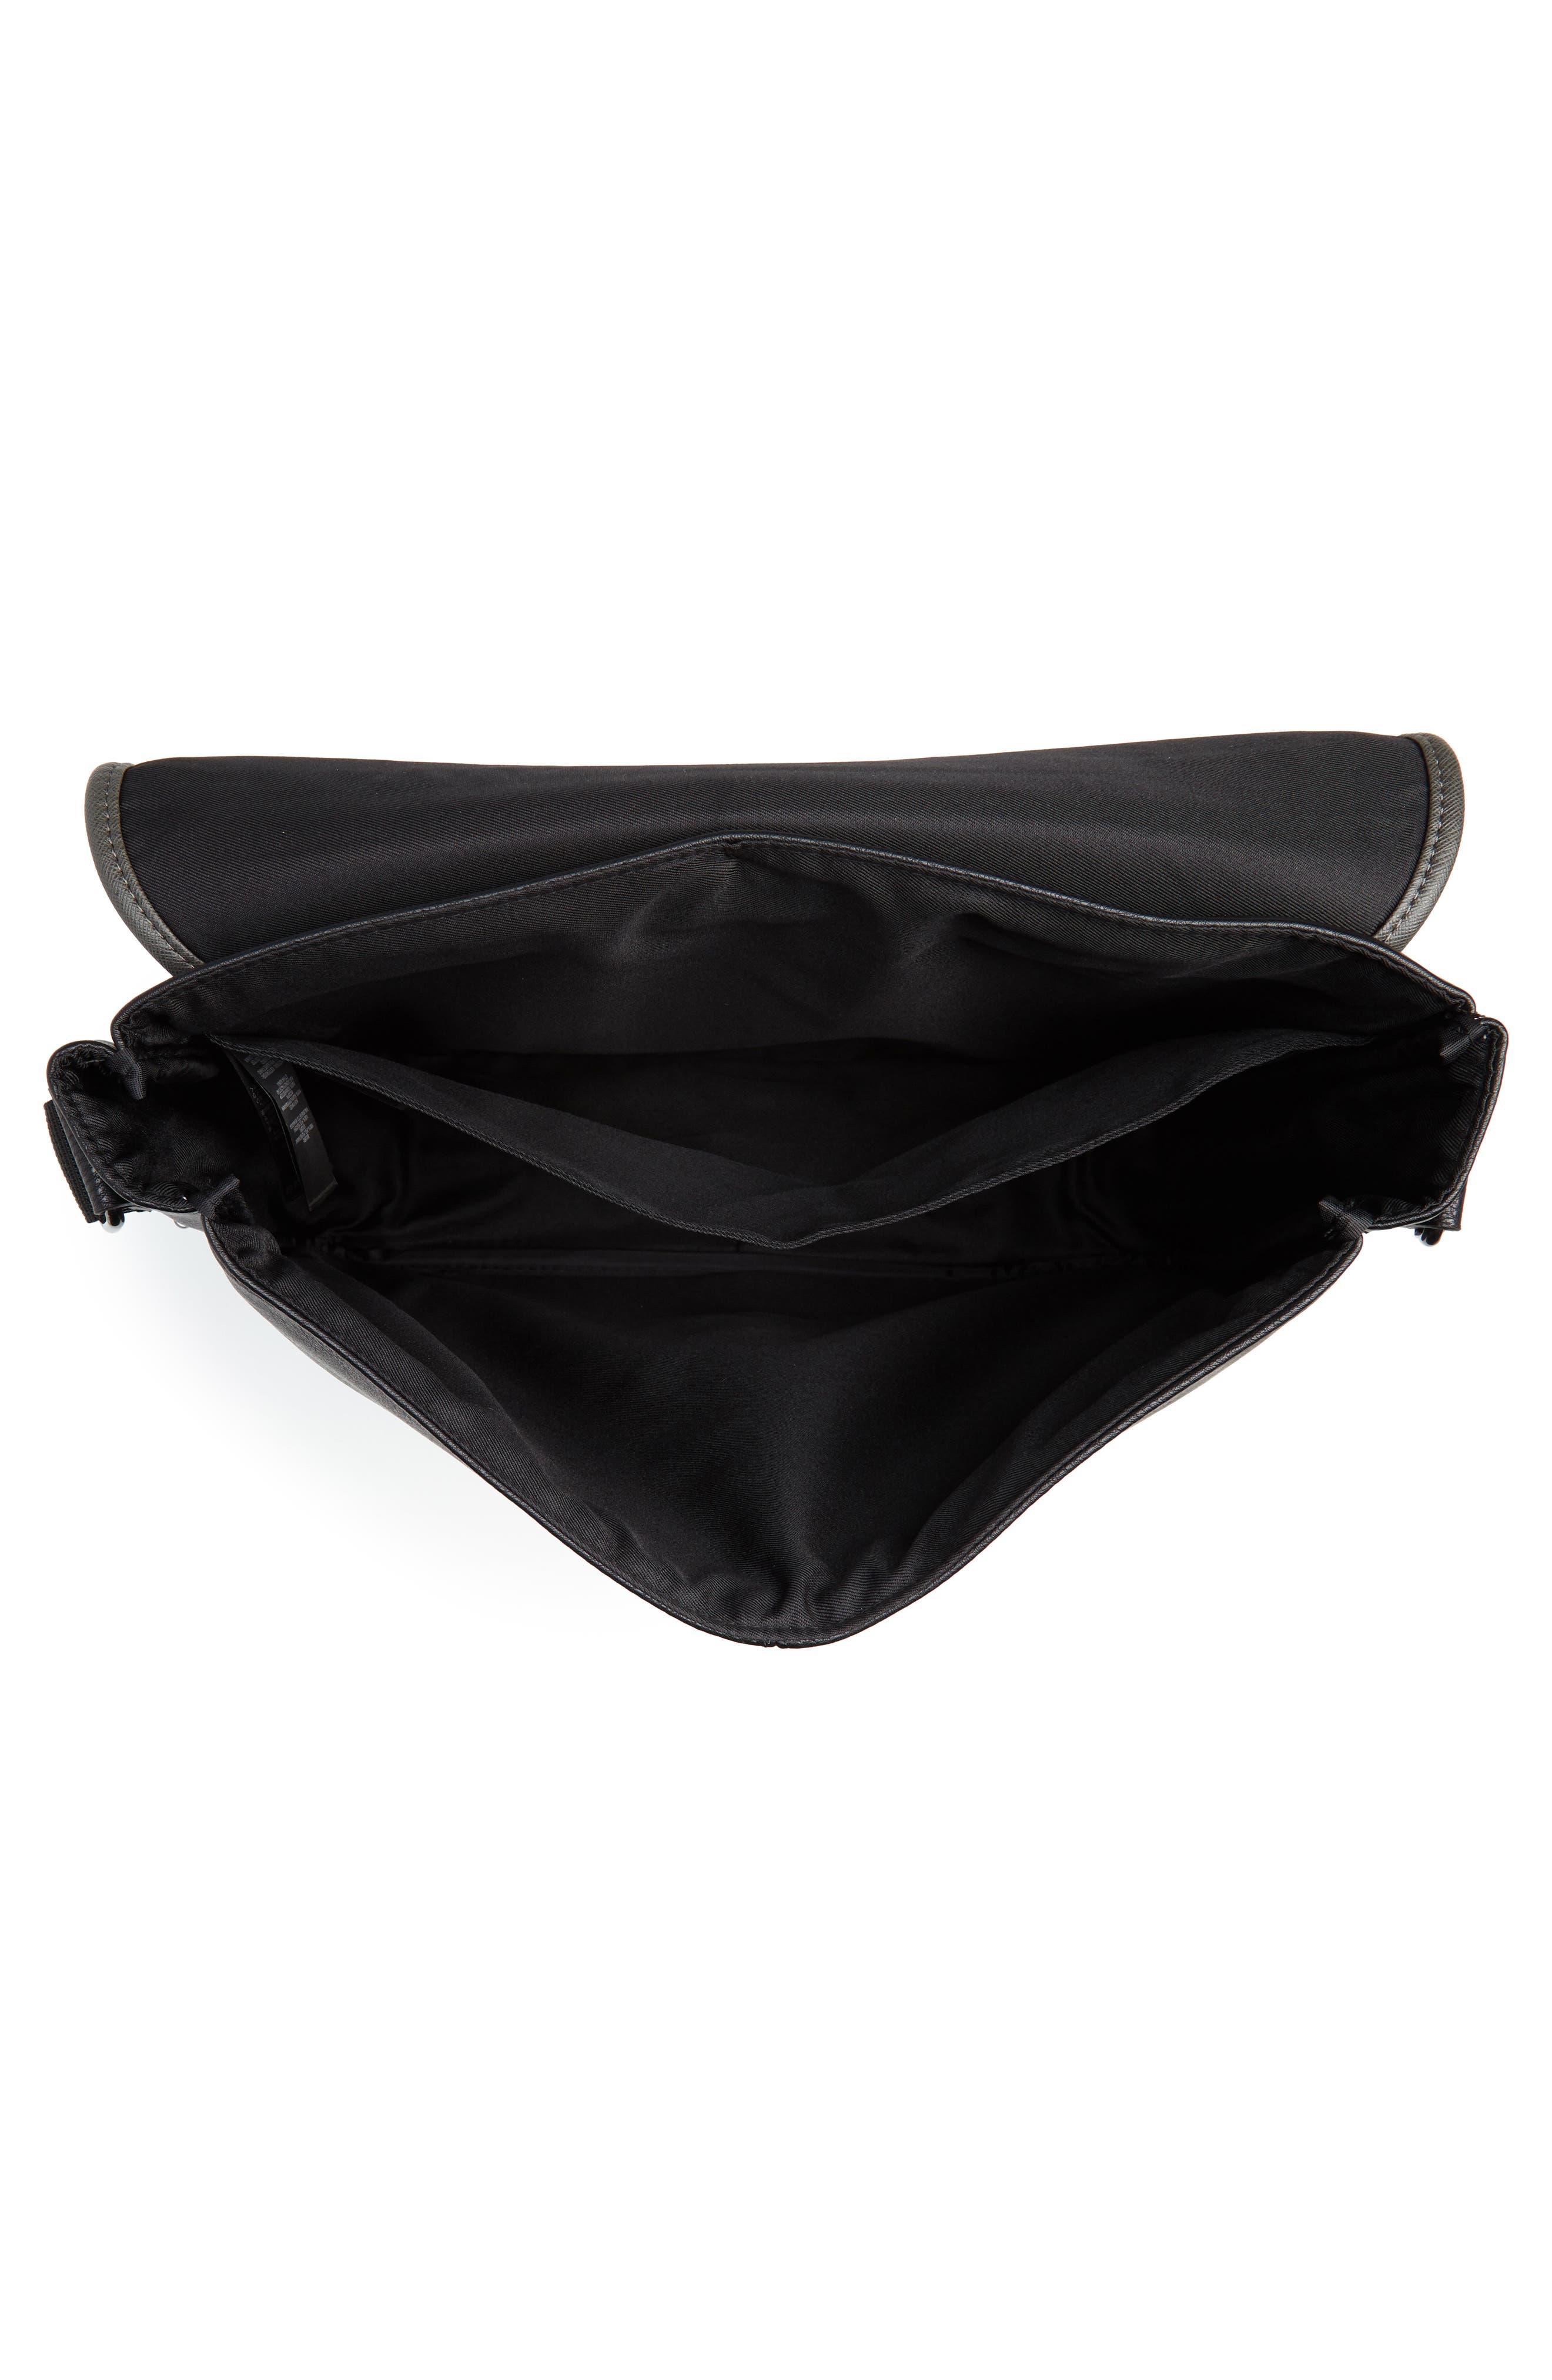 Kingcol Faux Leather Messenger Bag,                             Alternate thumbnail 6, color,                             Black